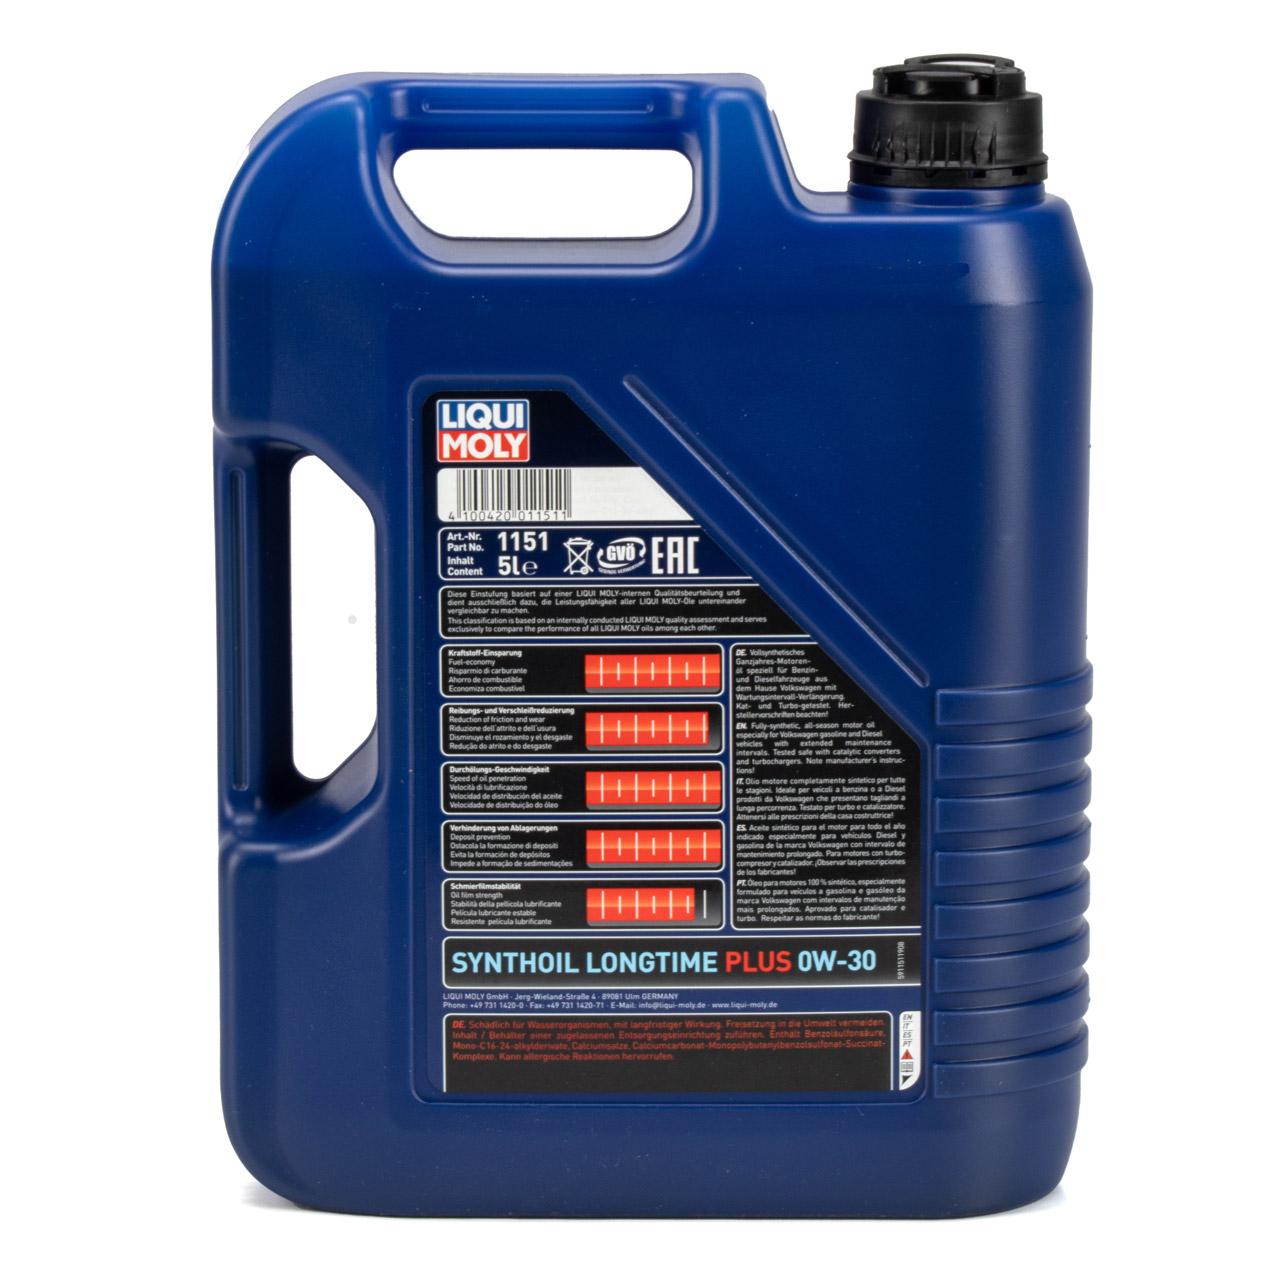 LIQUI MOLY SYNTHOIL LONGTIME PLUS Motoröl Öl 0W30 VW 503/506.00 - 5L 5 Liter